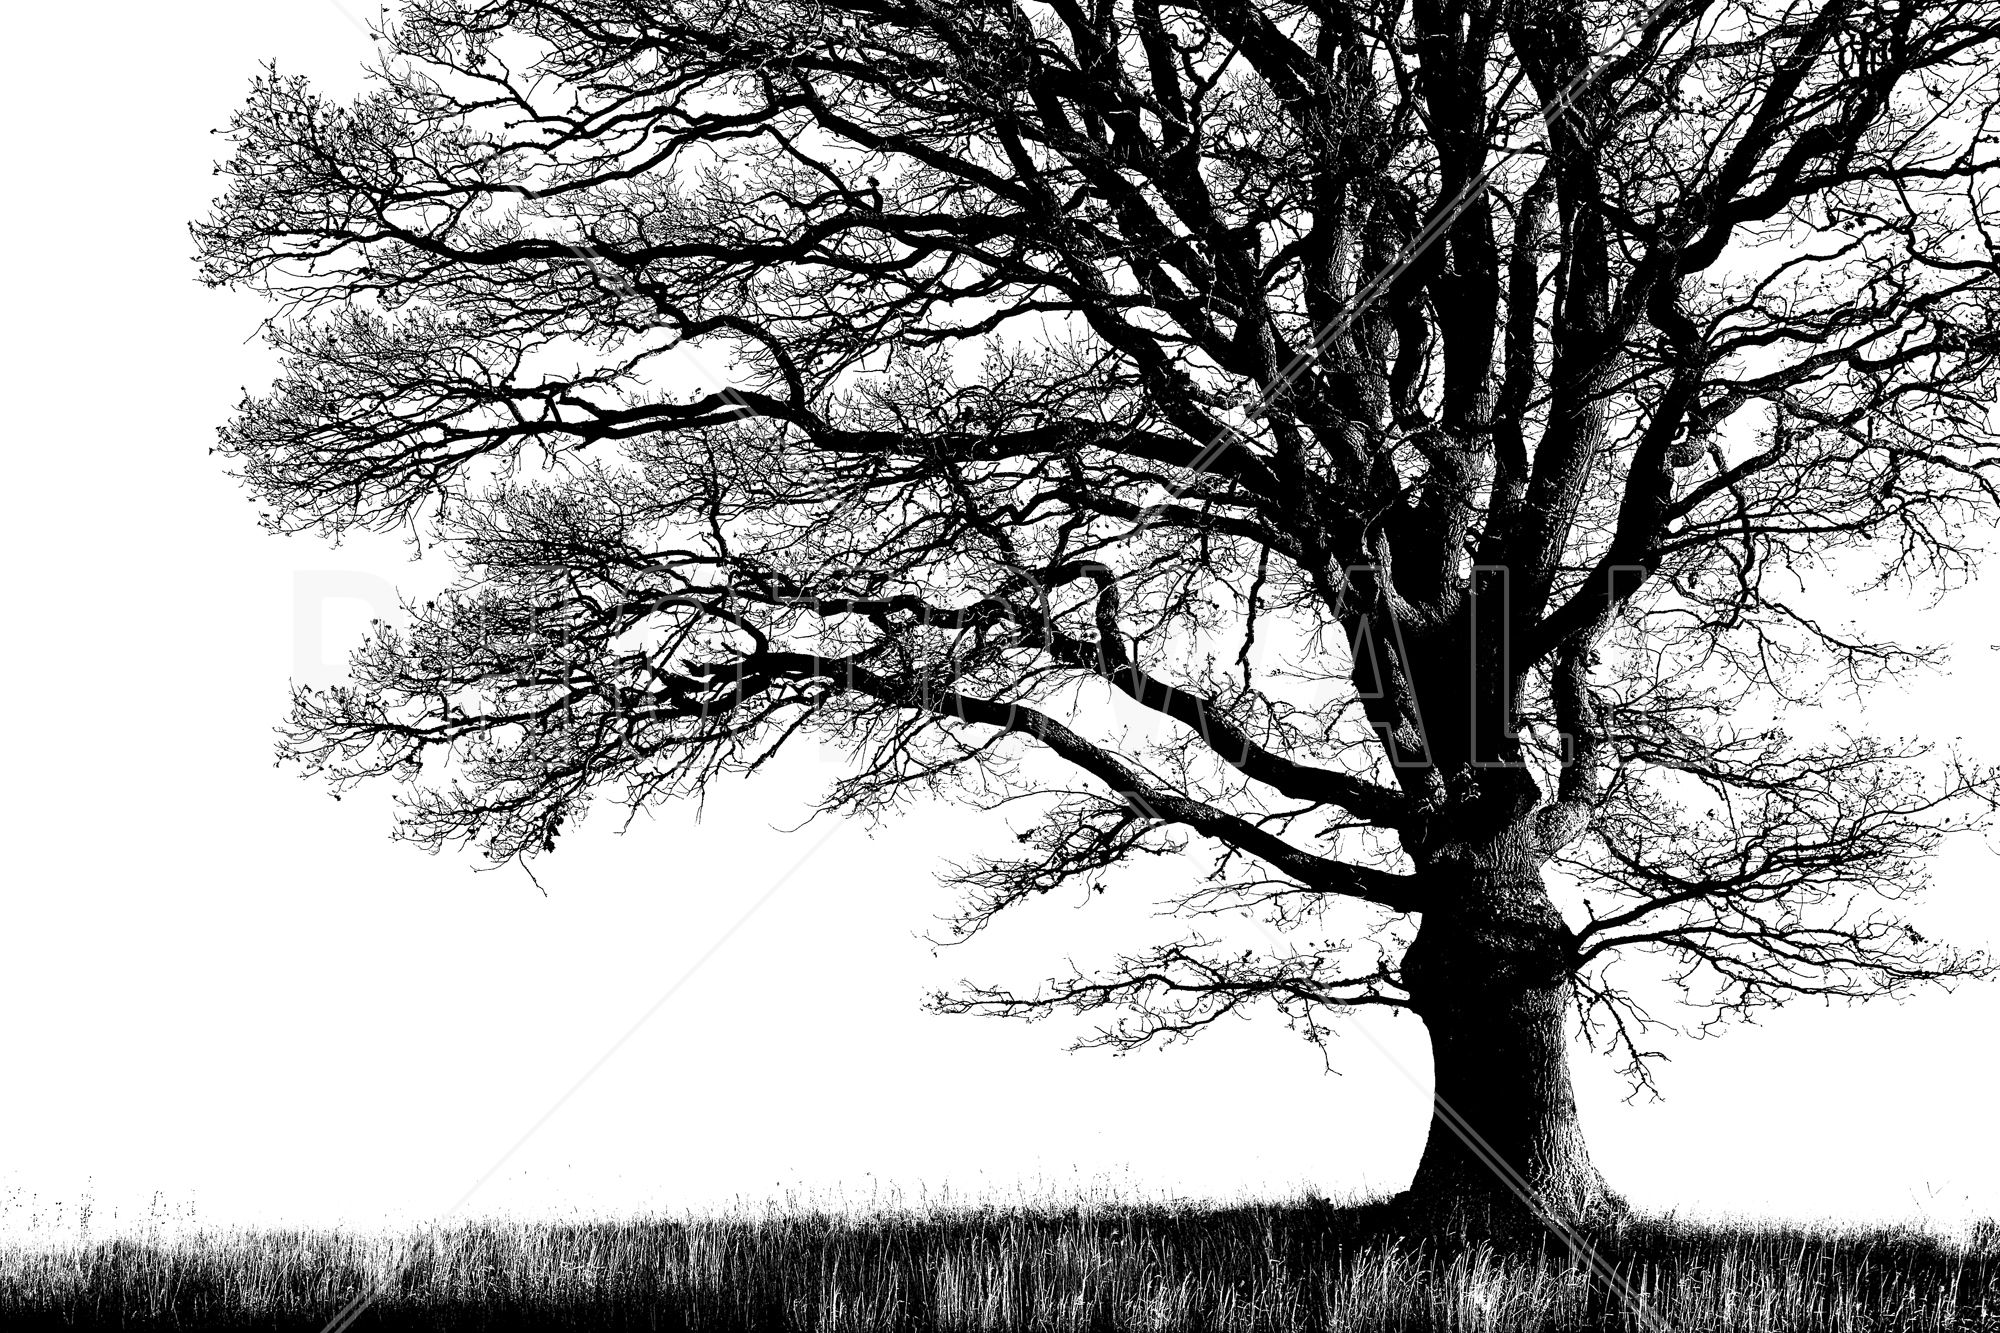 Alone Tree - Tapetit / tapetti - Photowall